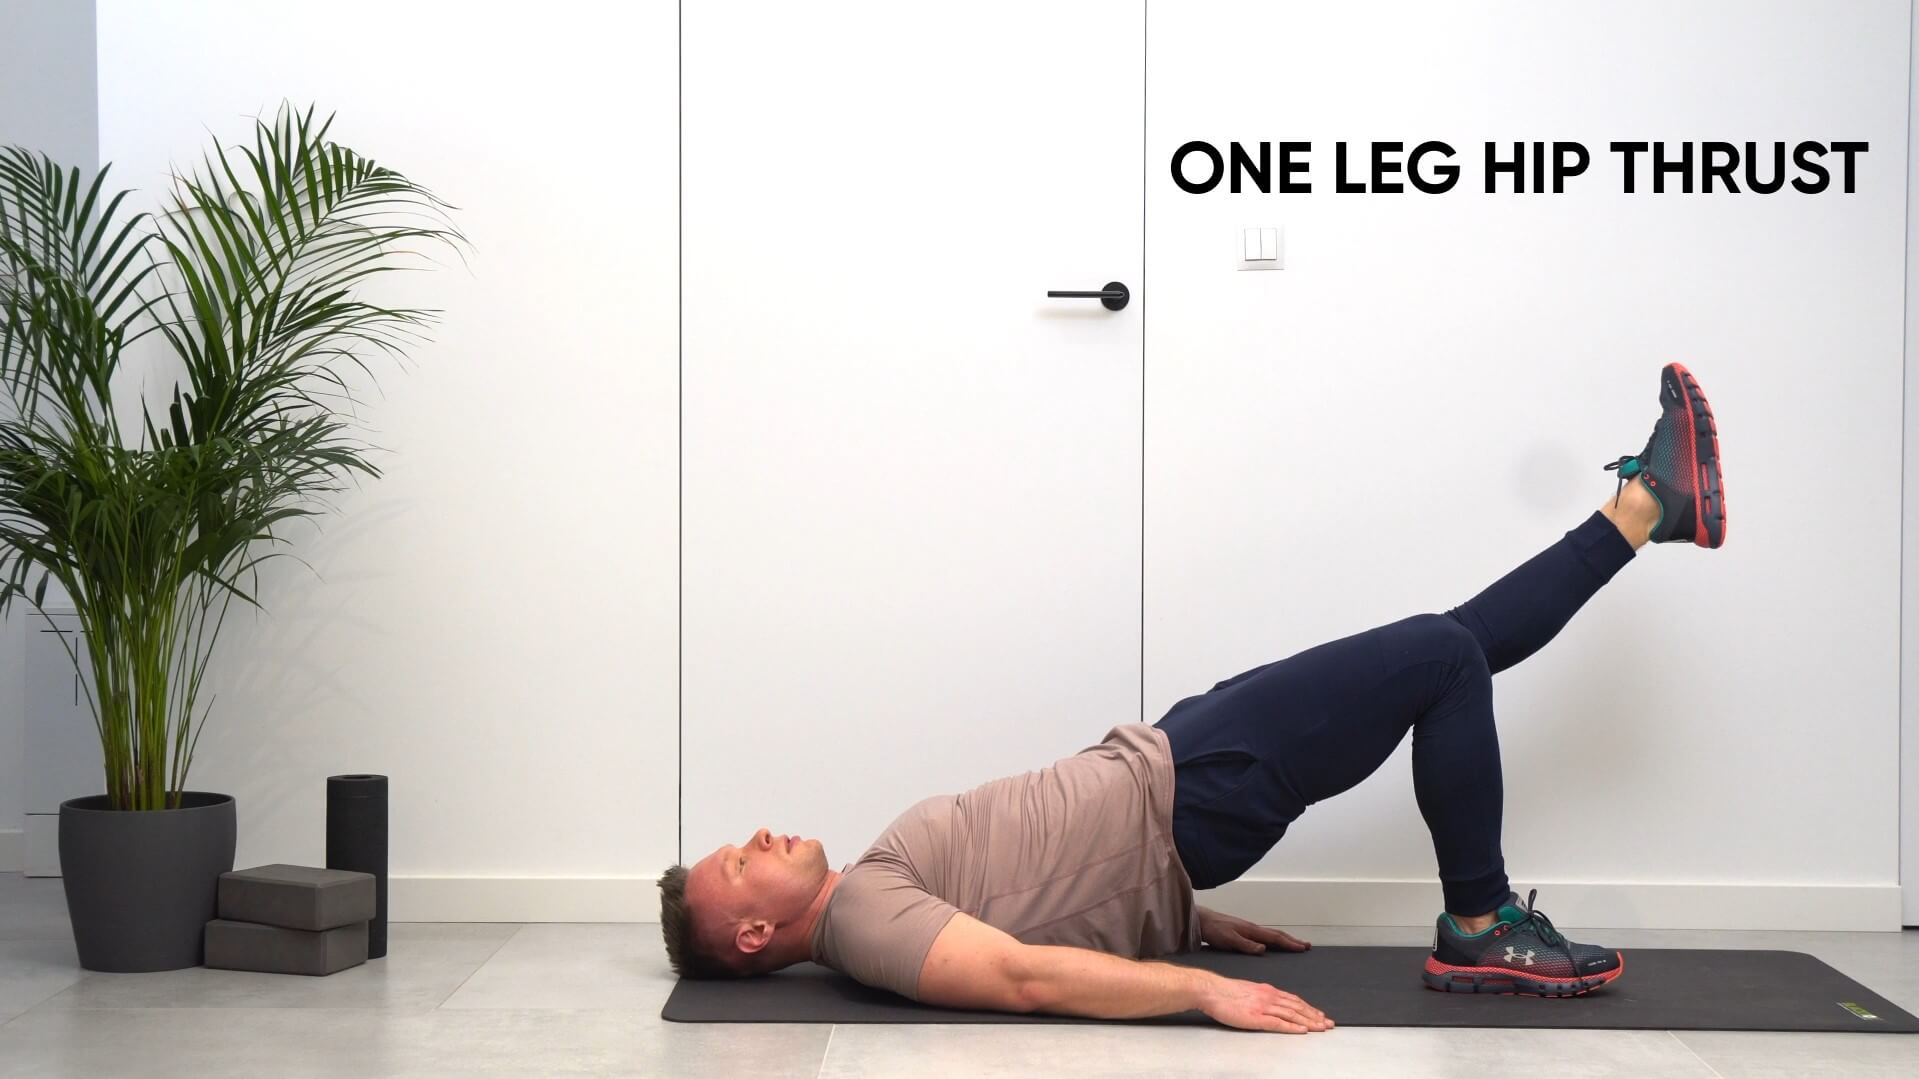 One leg hip thrust